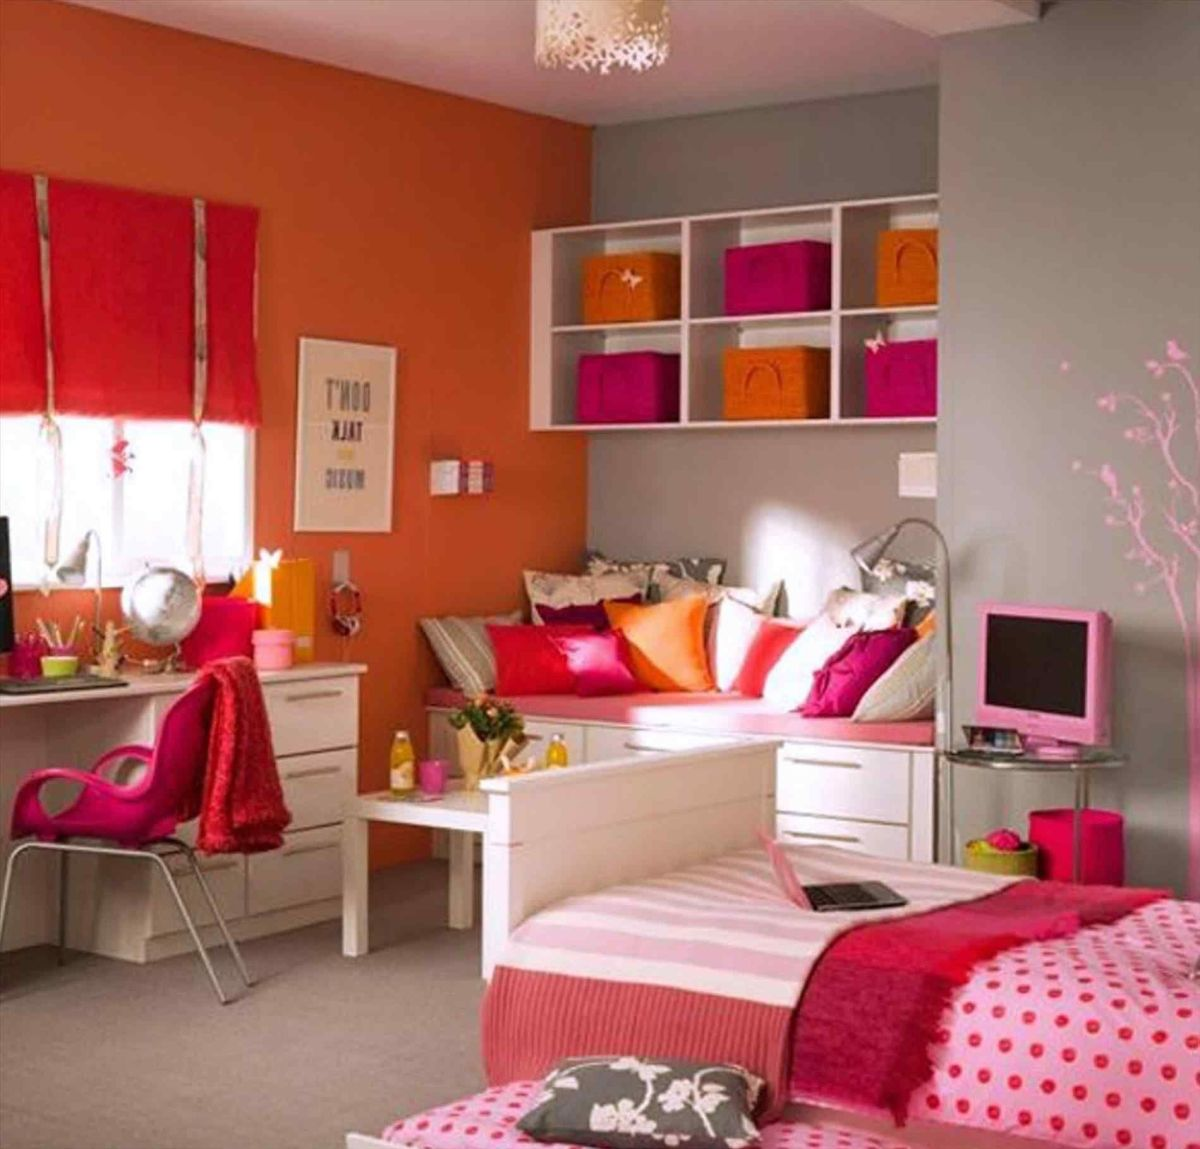 Charming fun tween bedroom ideas for girl 38